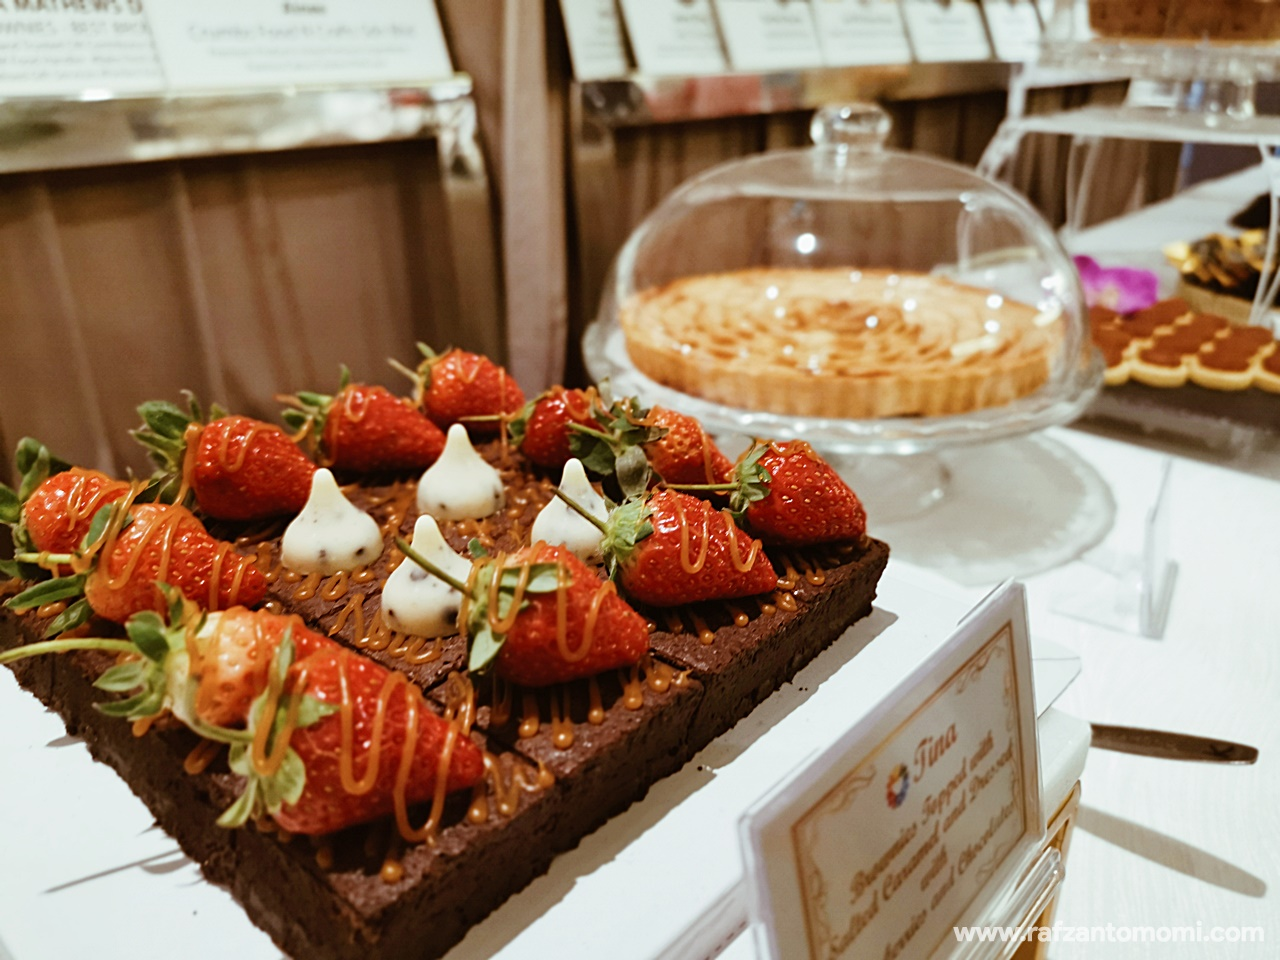 Anchor Food Professionals Malaysia-Brunei Sambut Ulangtahun 'Legendairy' Ke-133